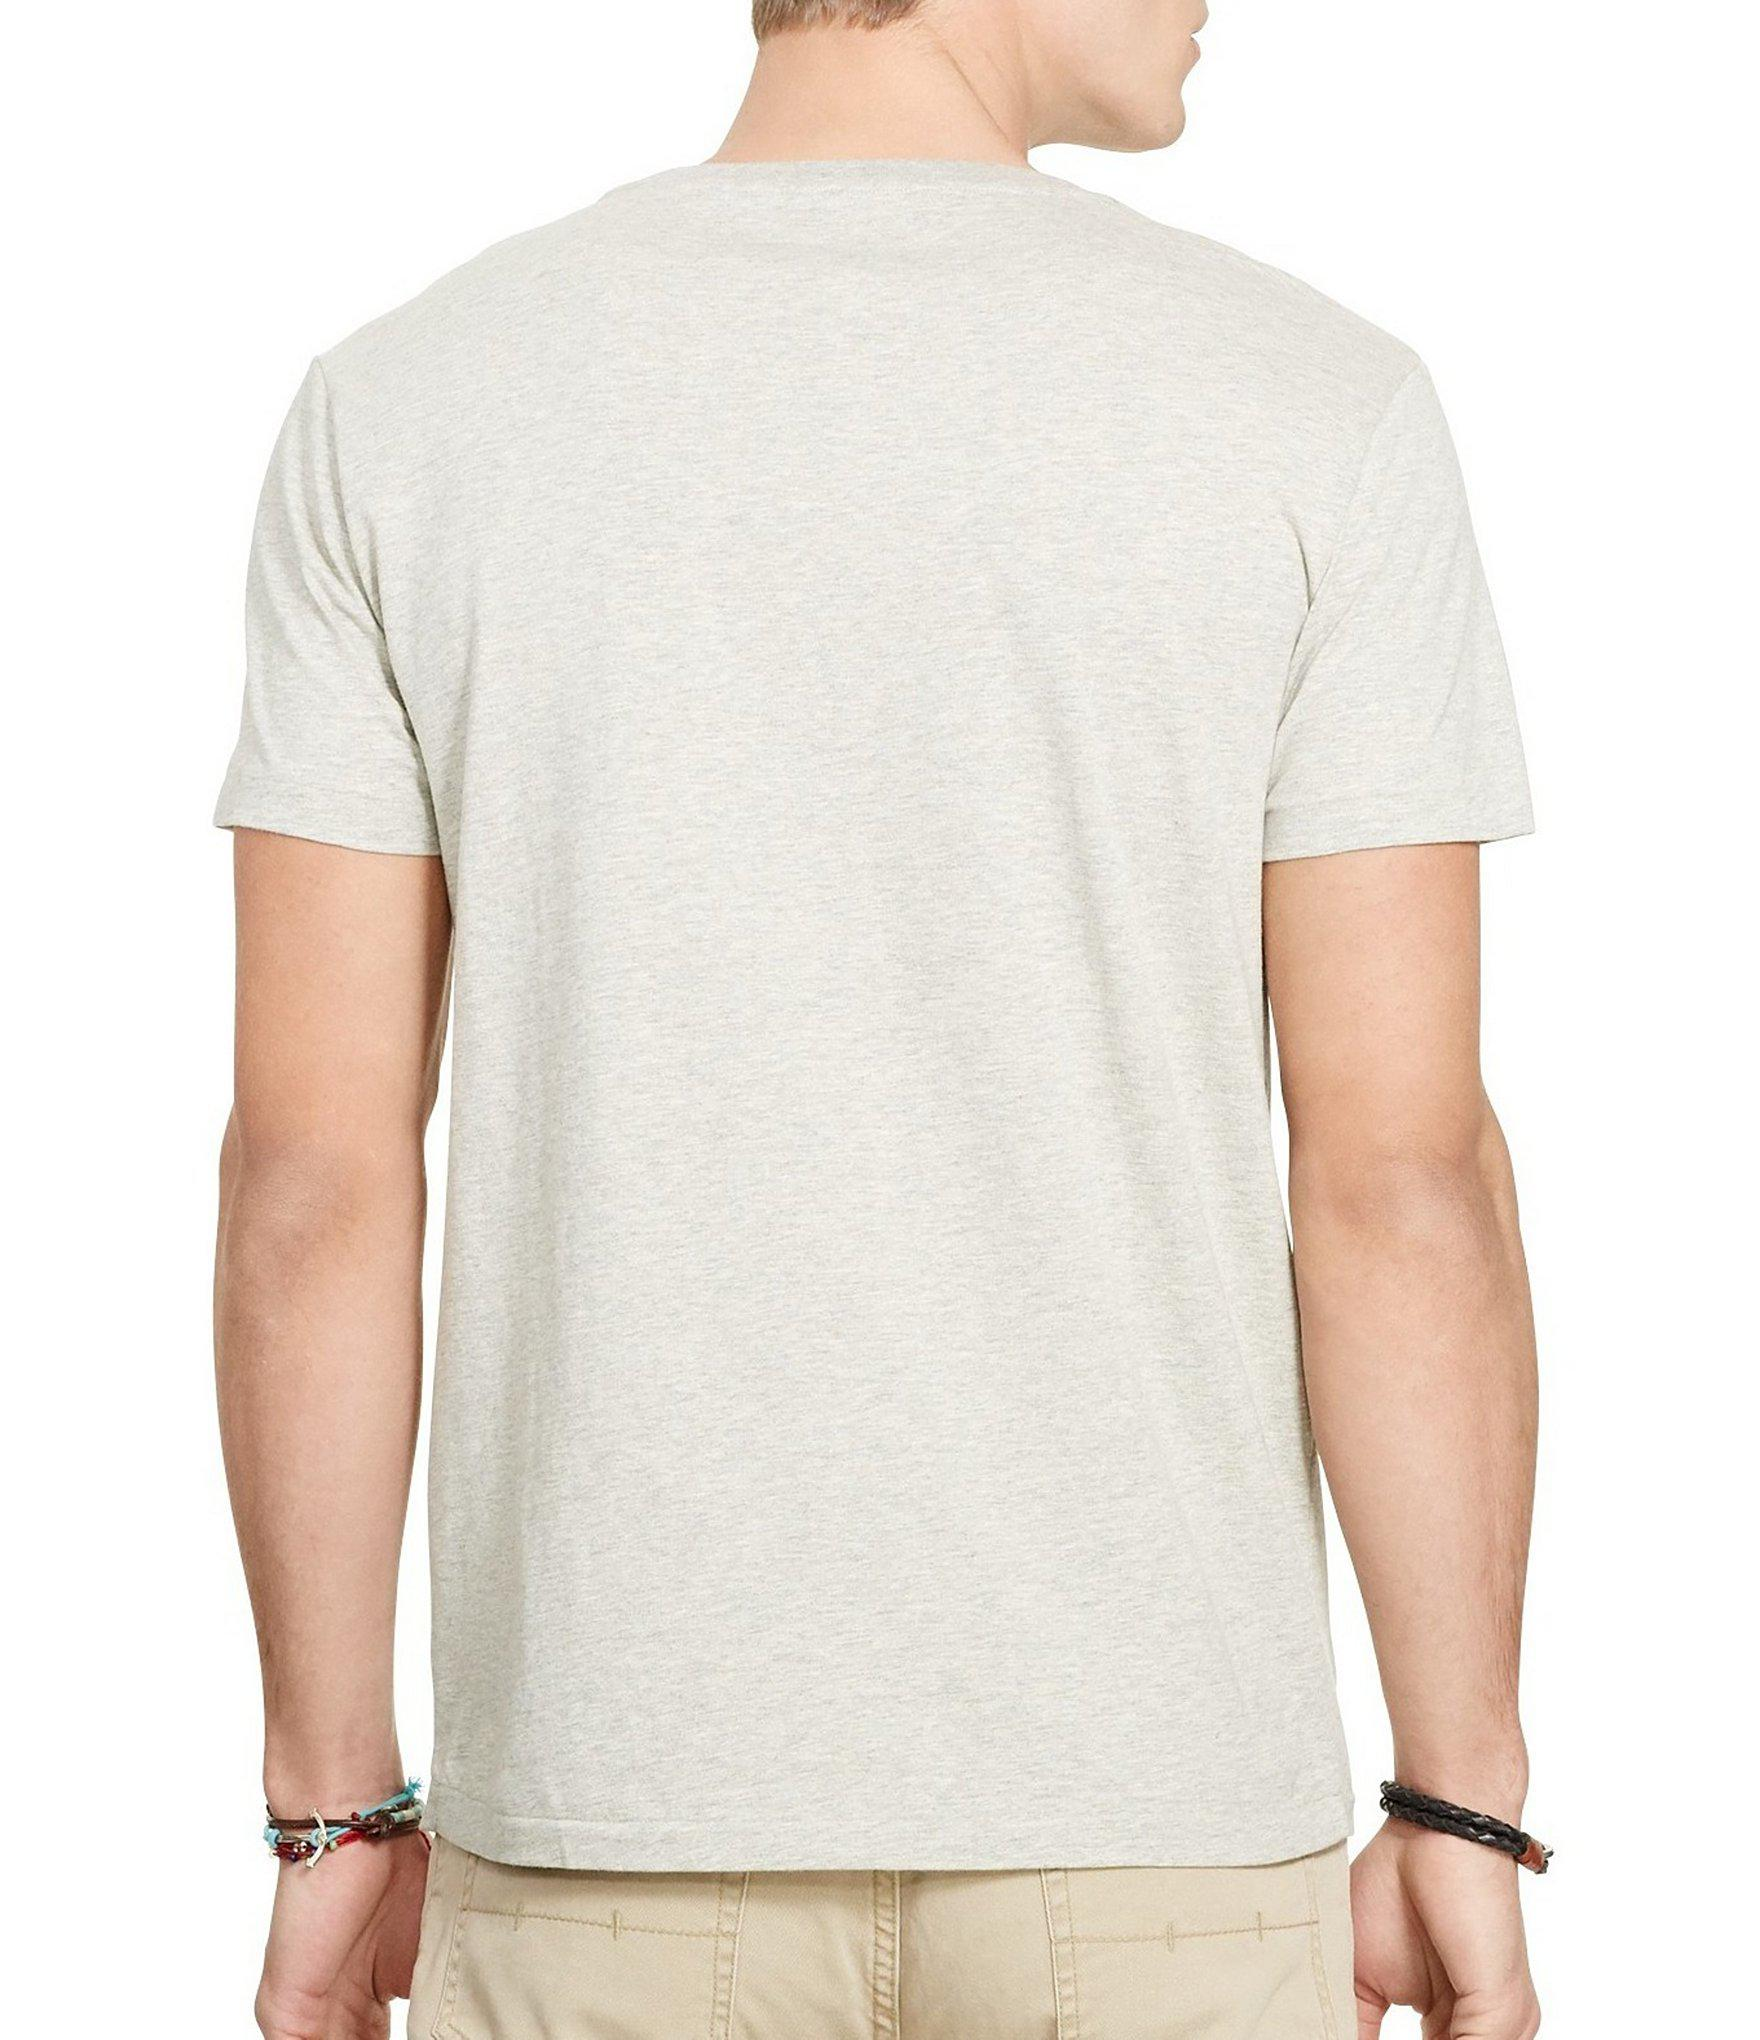 6880a859d Lyst - Polo Ralph Lauren Classic-fit Short-sleeved Cotton Jersey V ...